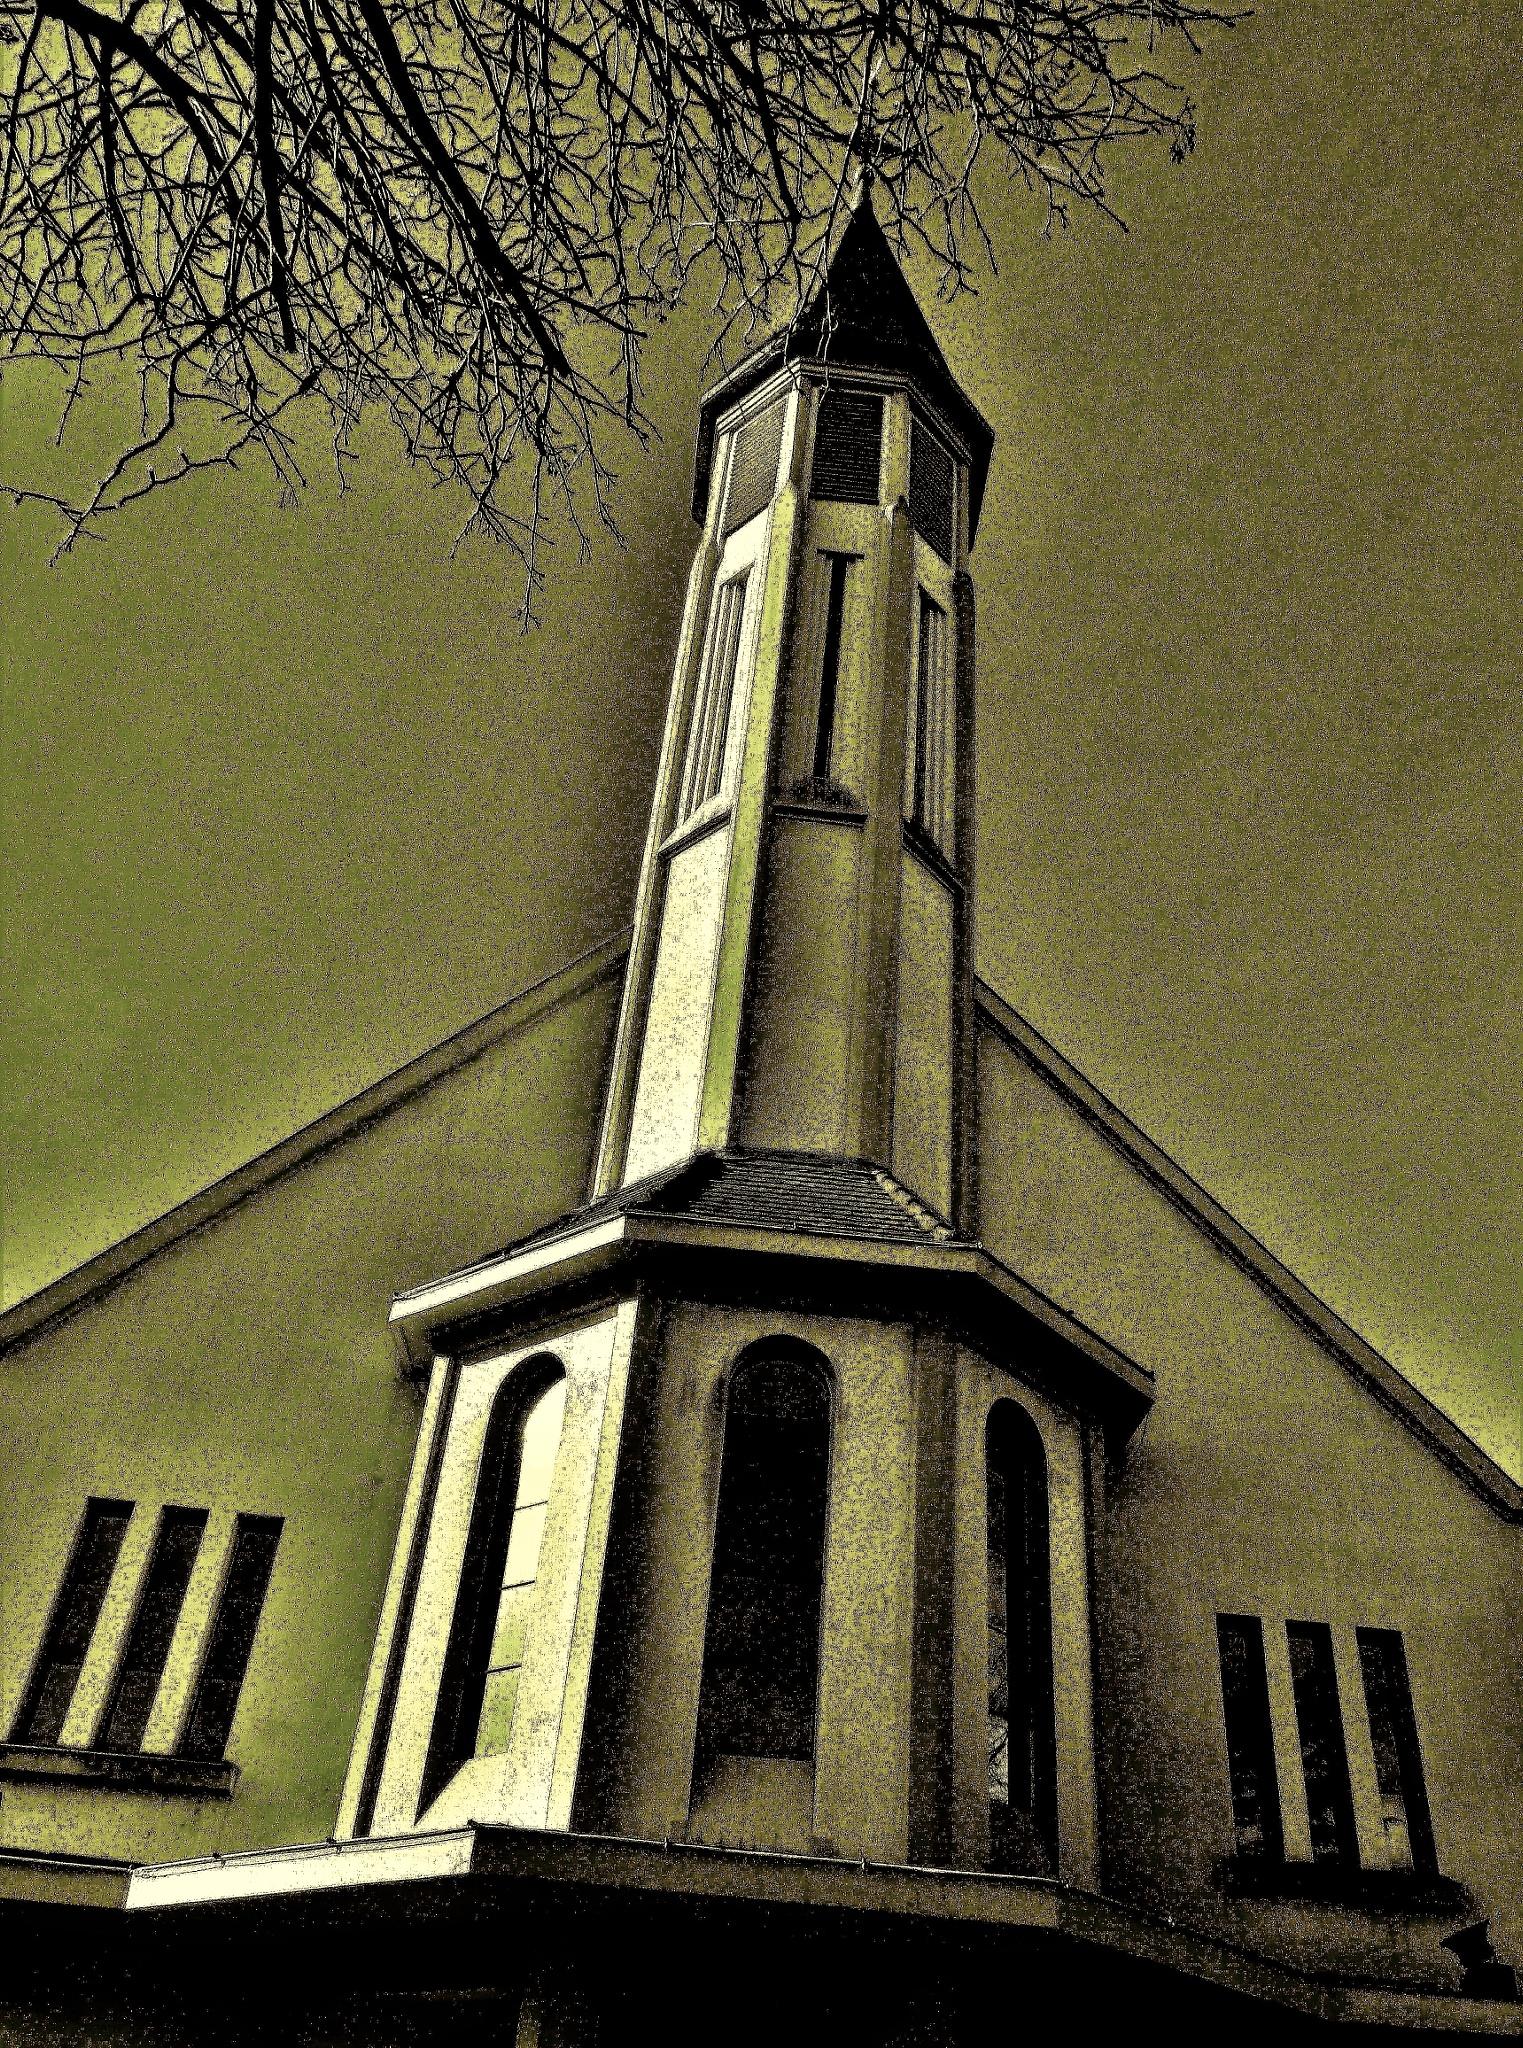 Church by catherinevigili